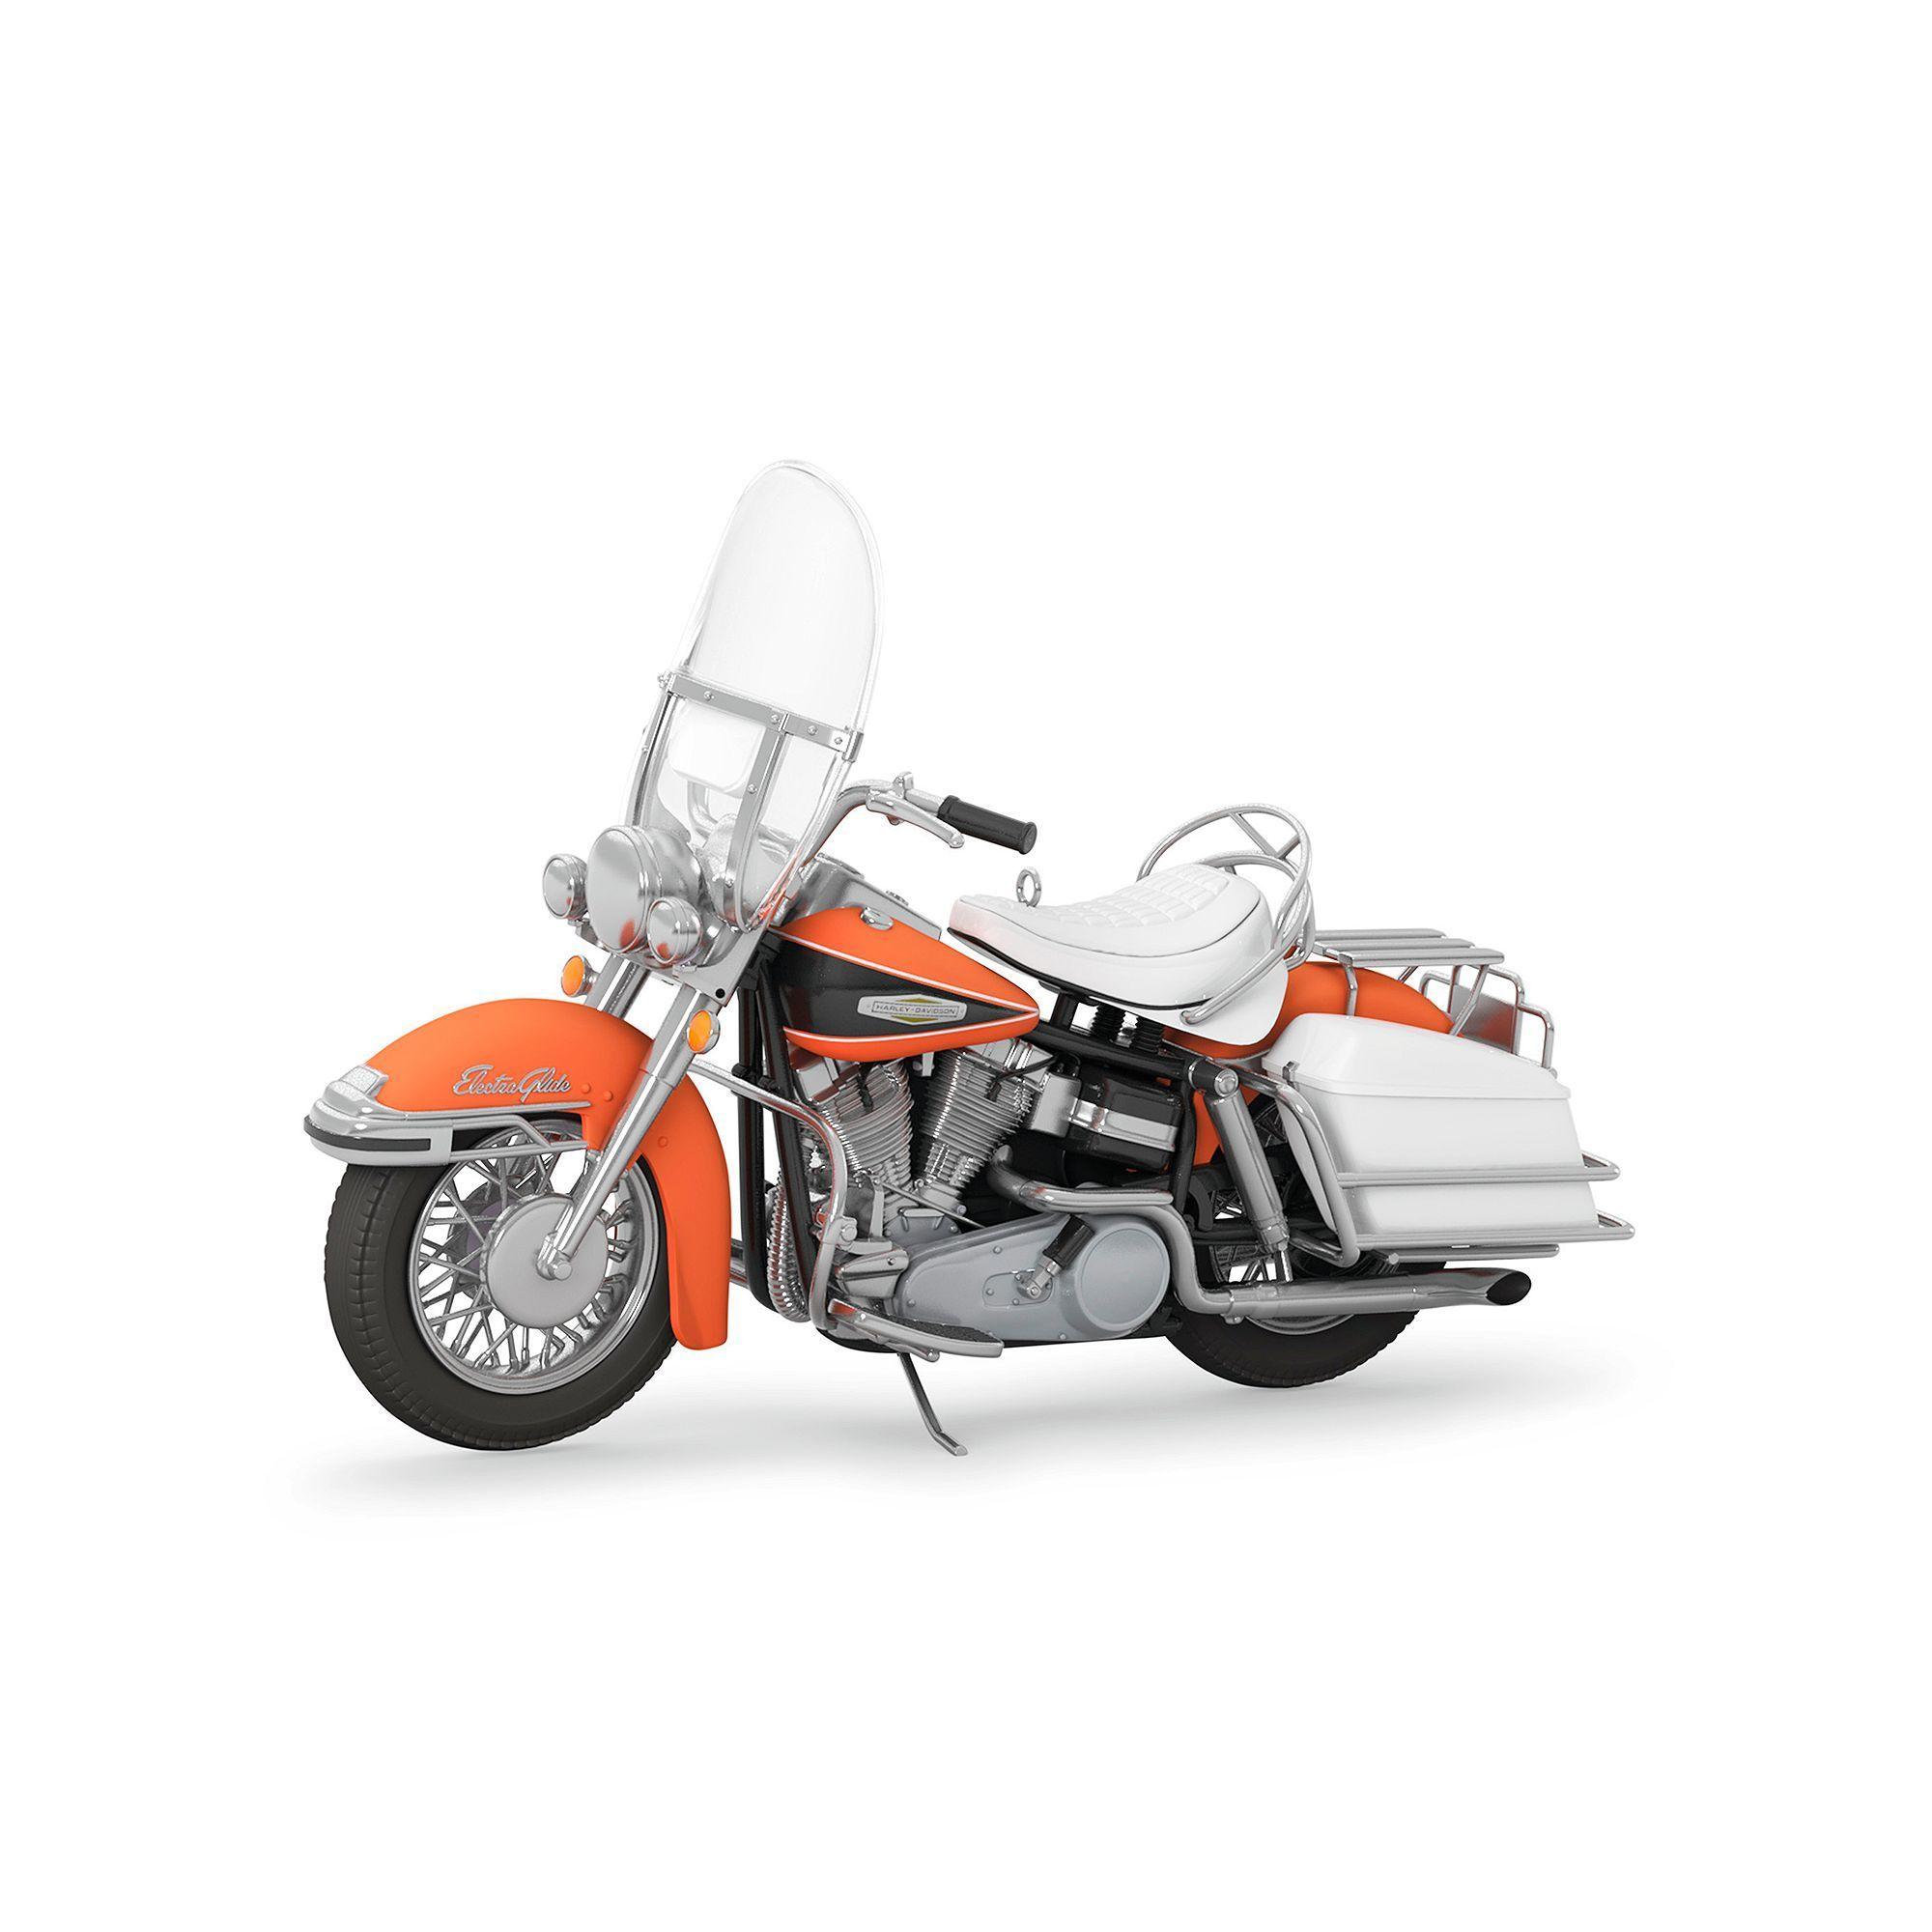 Hallmark Keepsake 2019 Harley-Davidson 1968 Flh Electra Glide Dated Christmas Ornament Harley Davidson 1968 FLH Electra Glide No. 19 2017 Hallmark